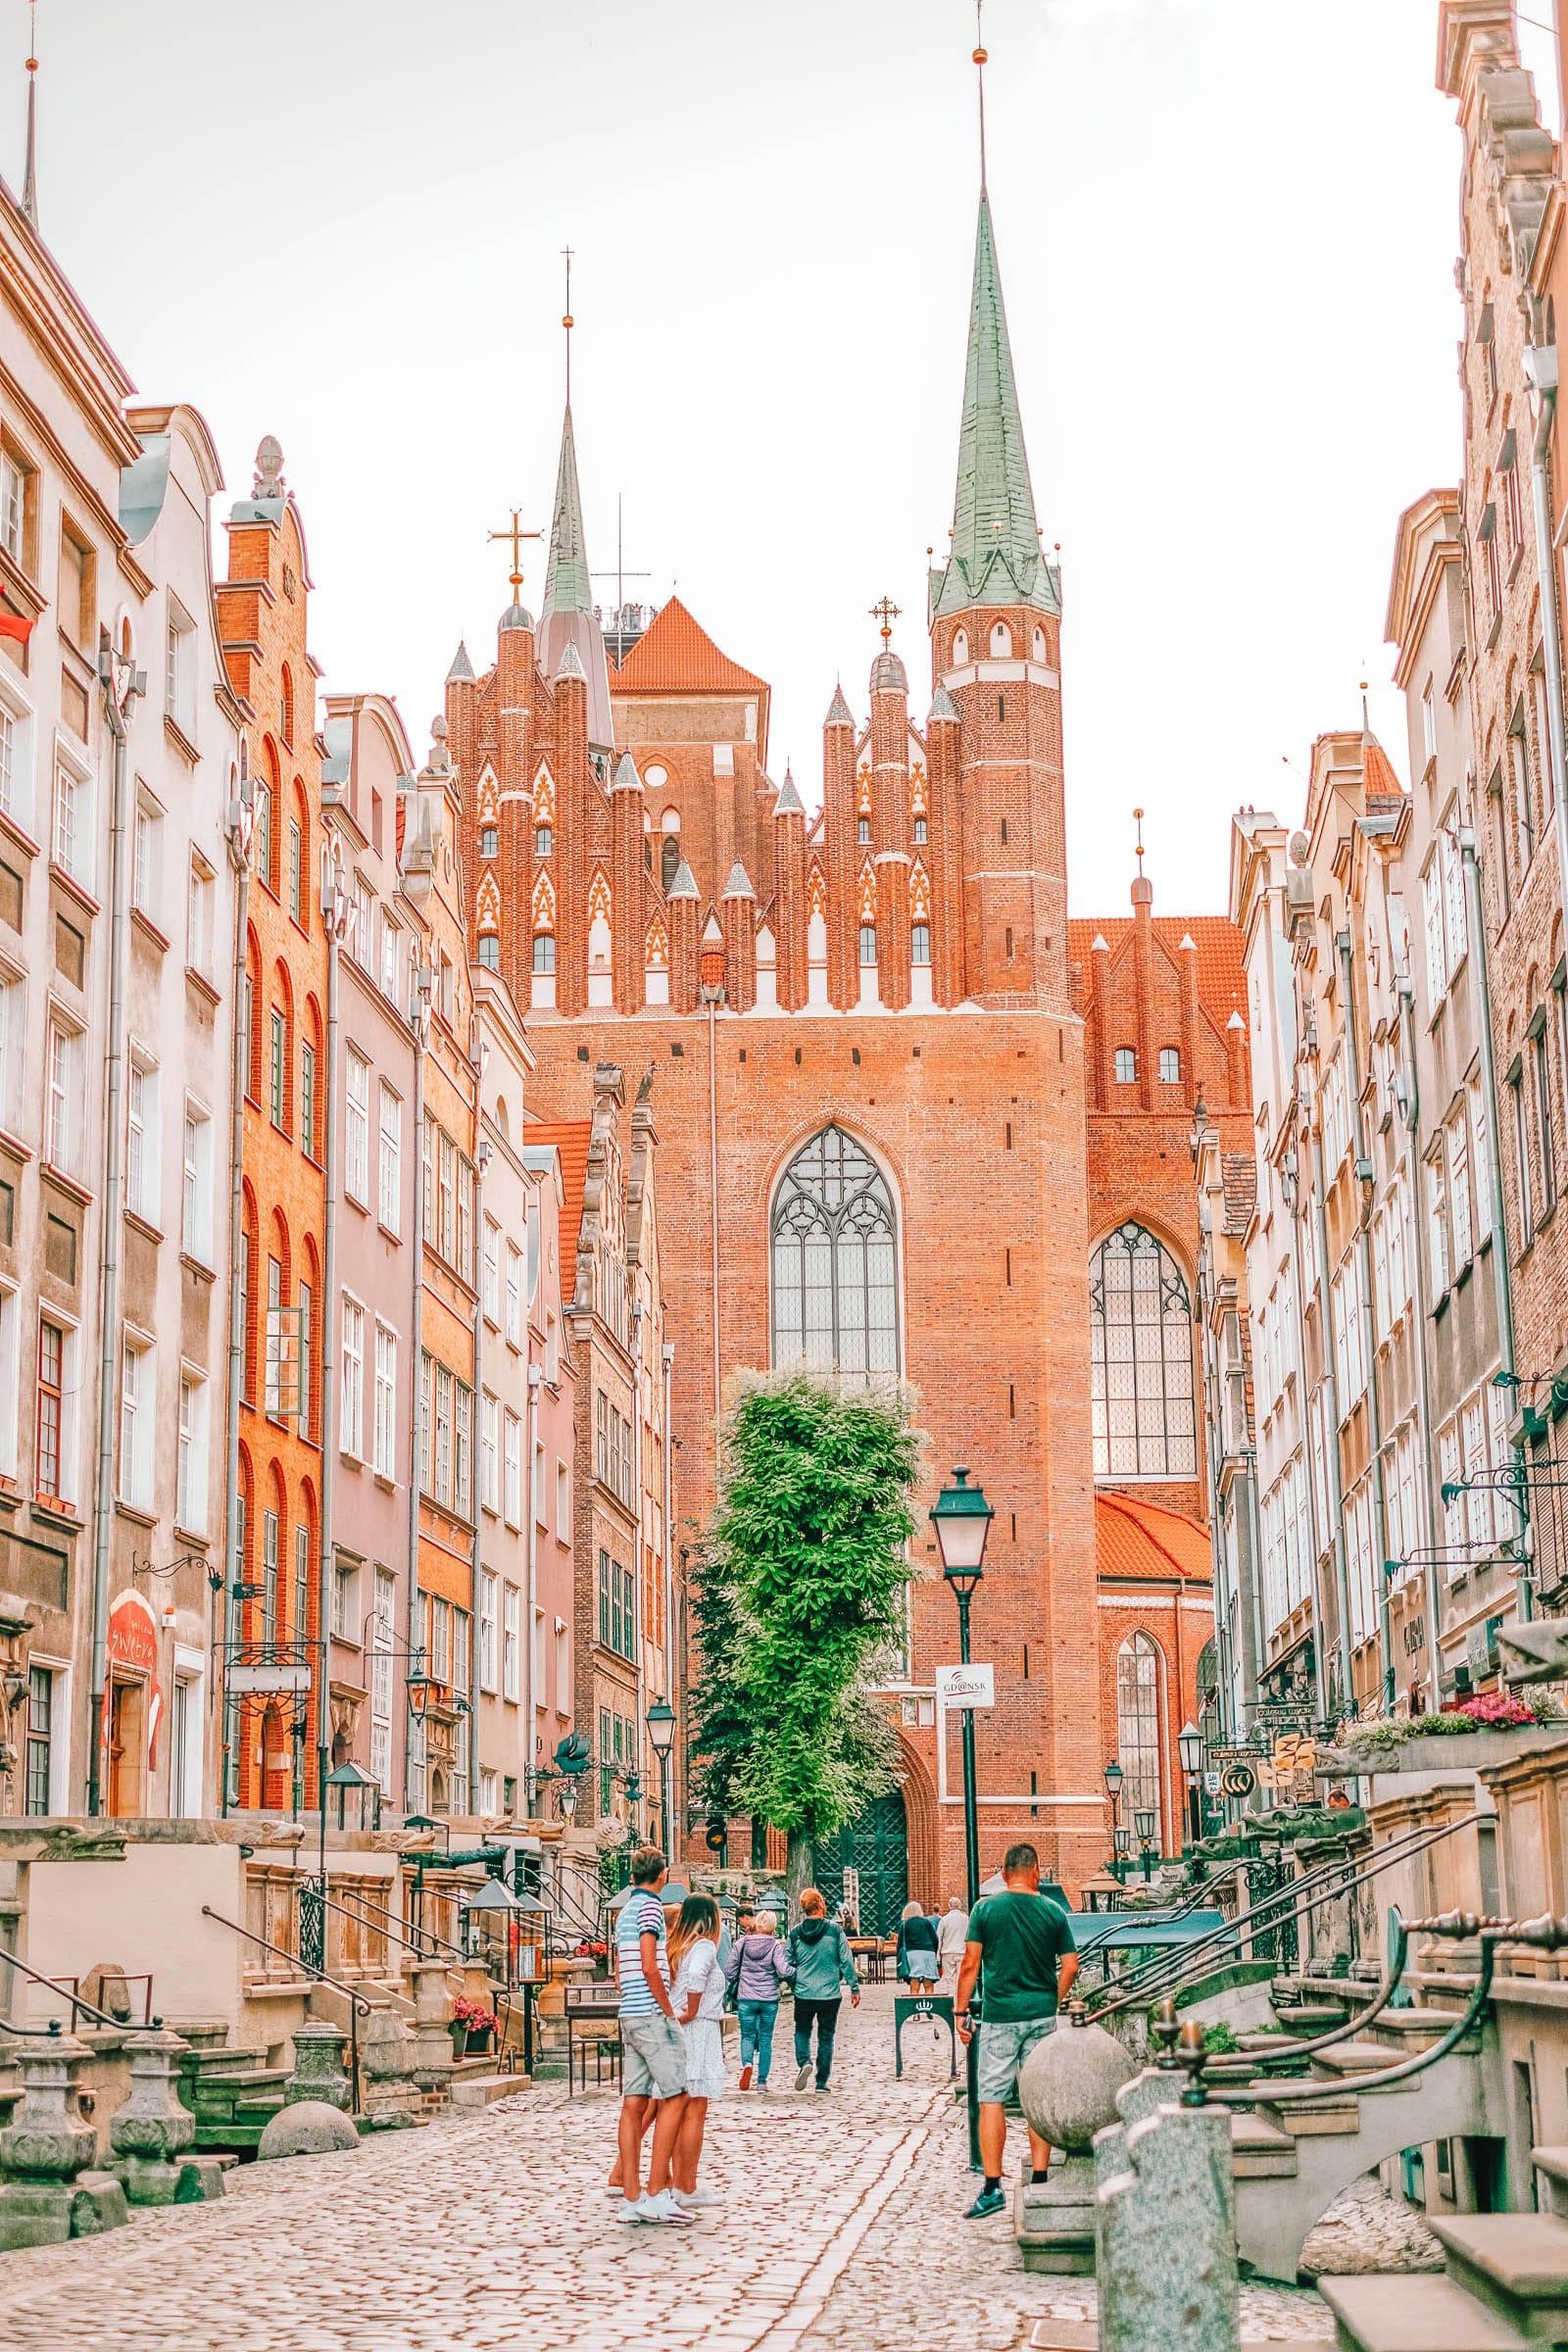 Best Things To Do In Gdansk (10)